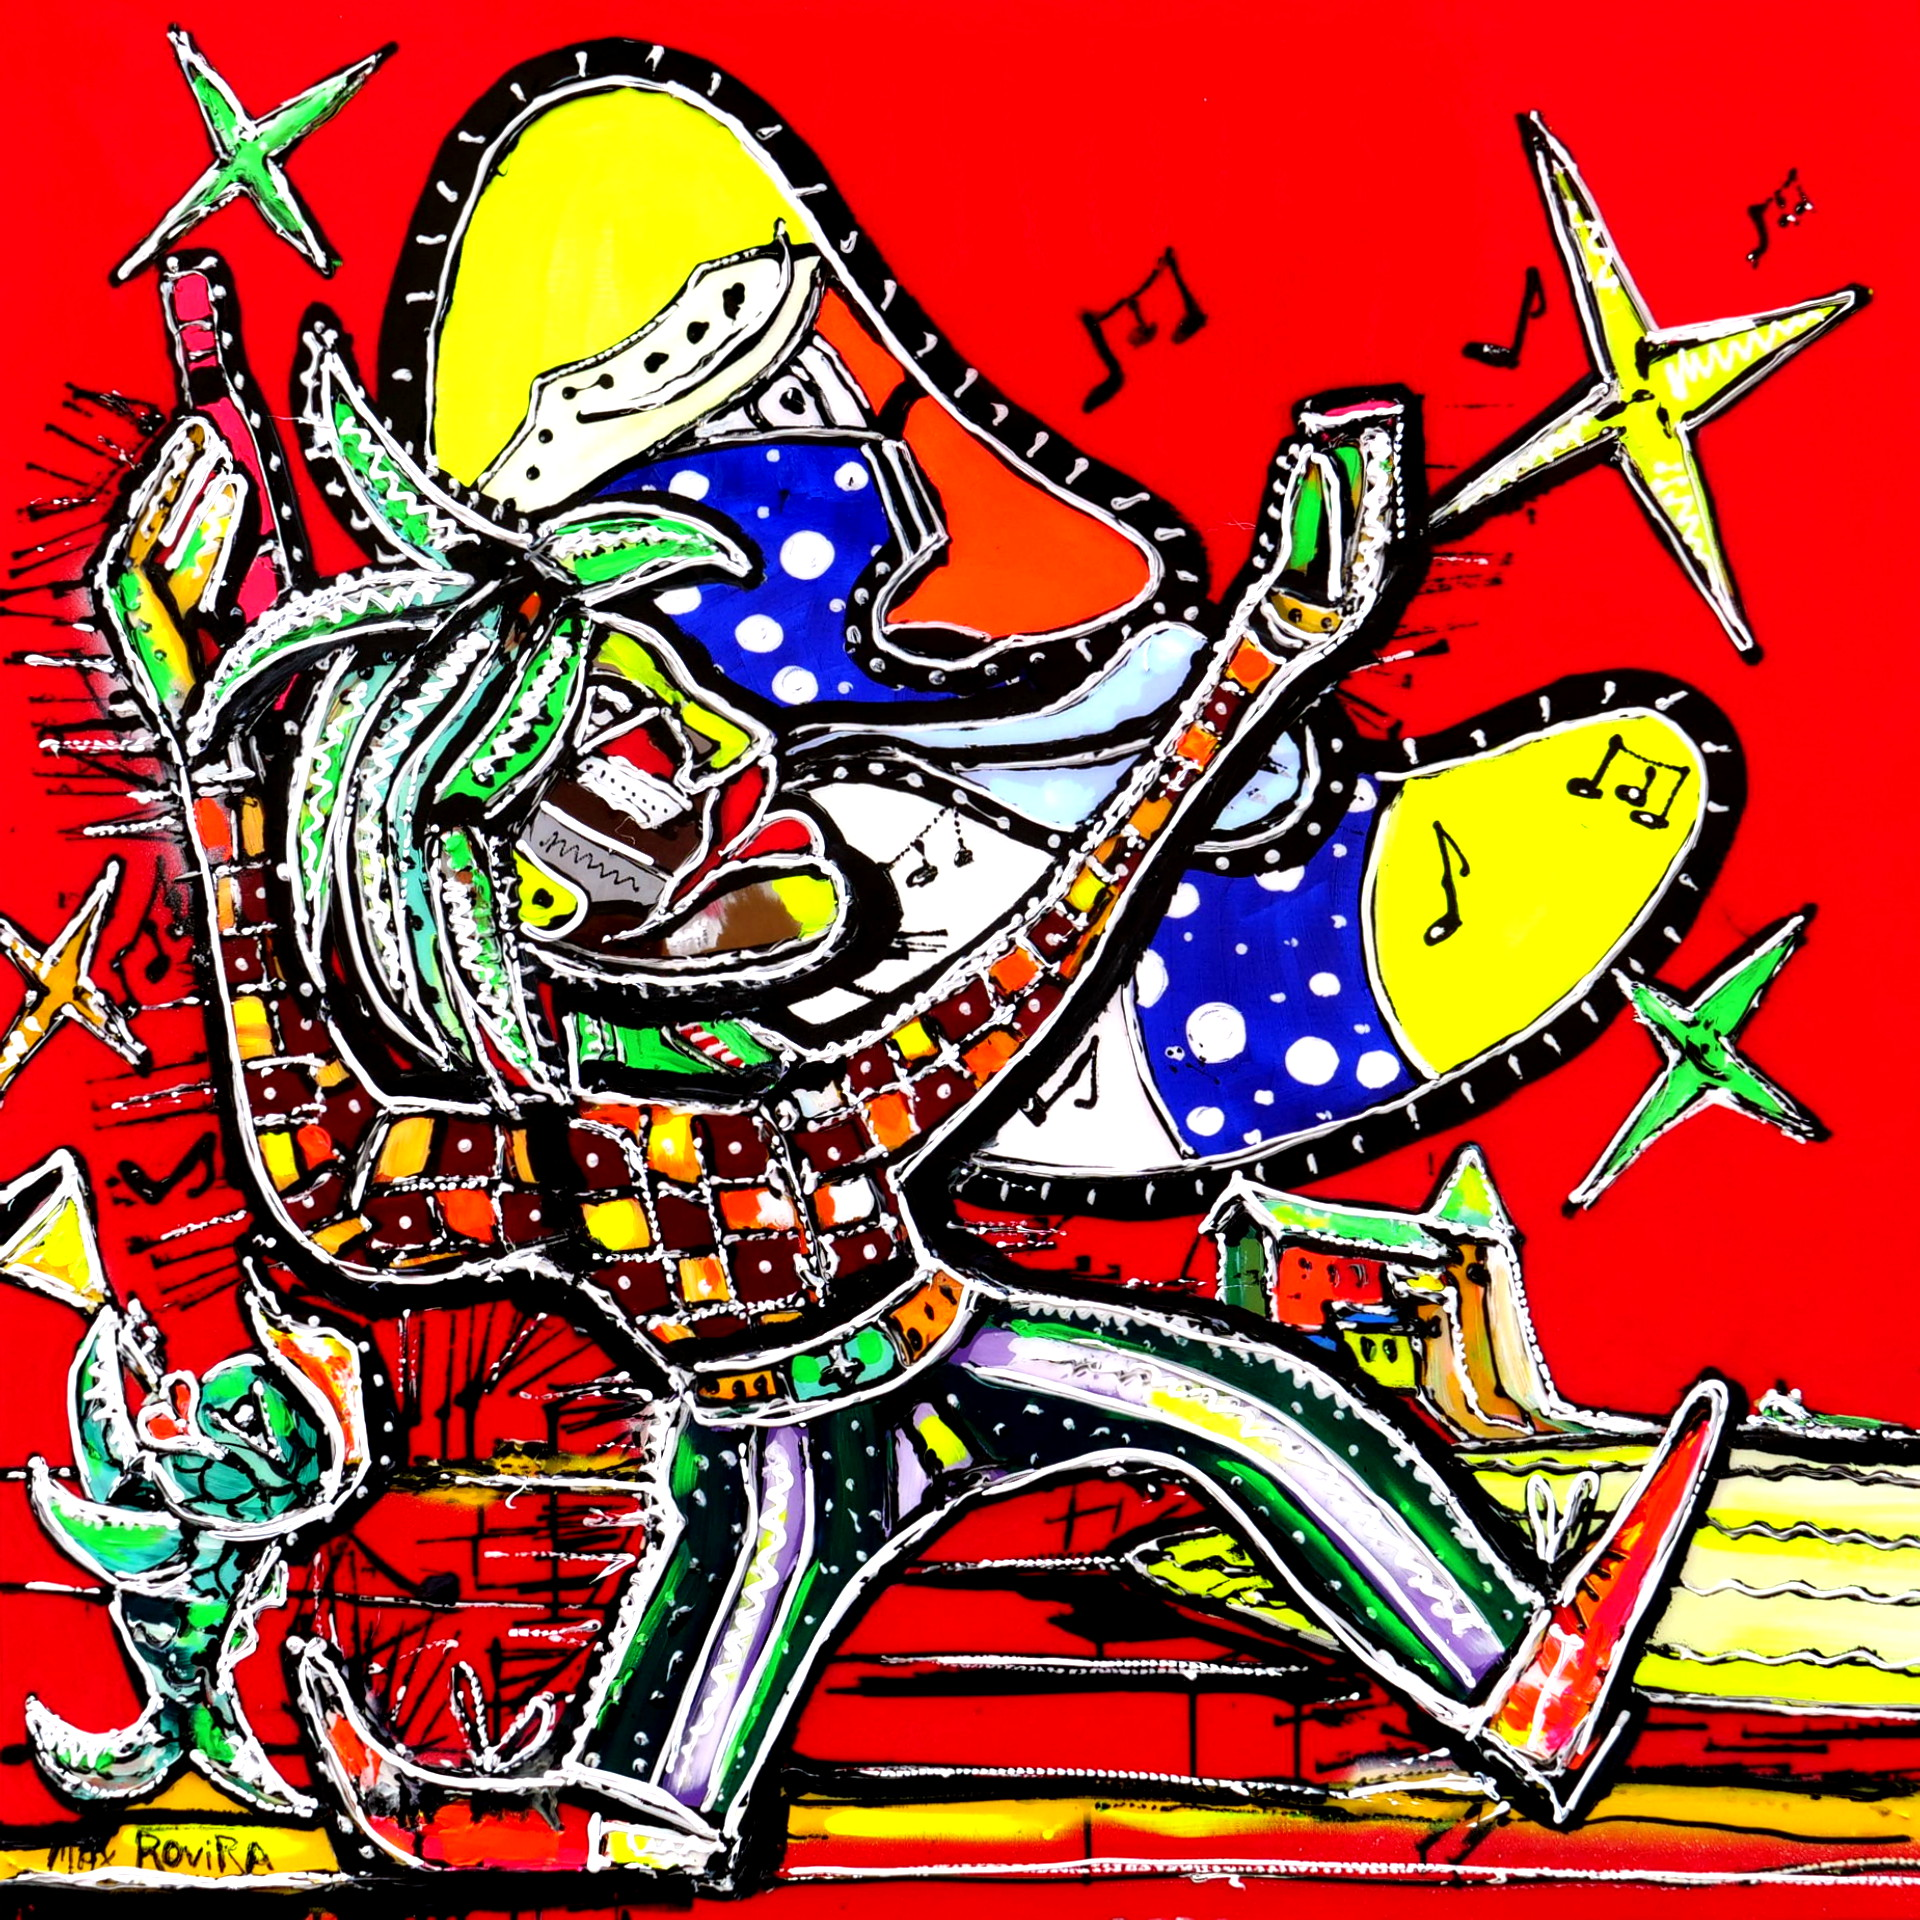 max rovira artiste peintre collioure le clown de la lune